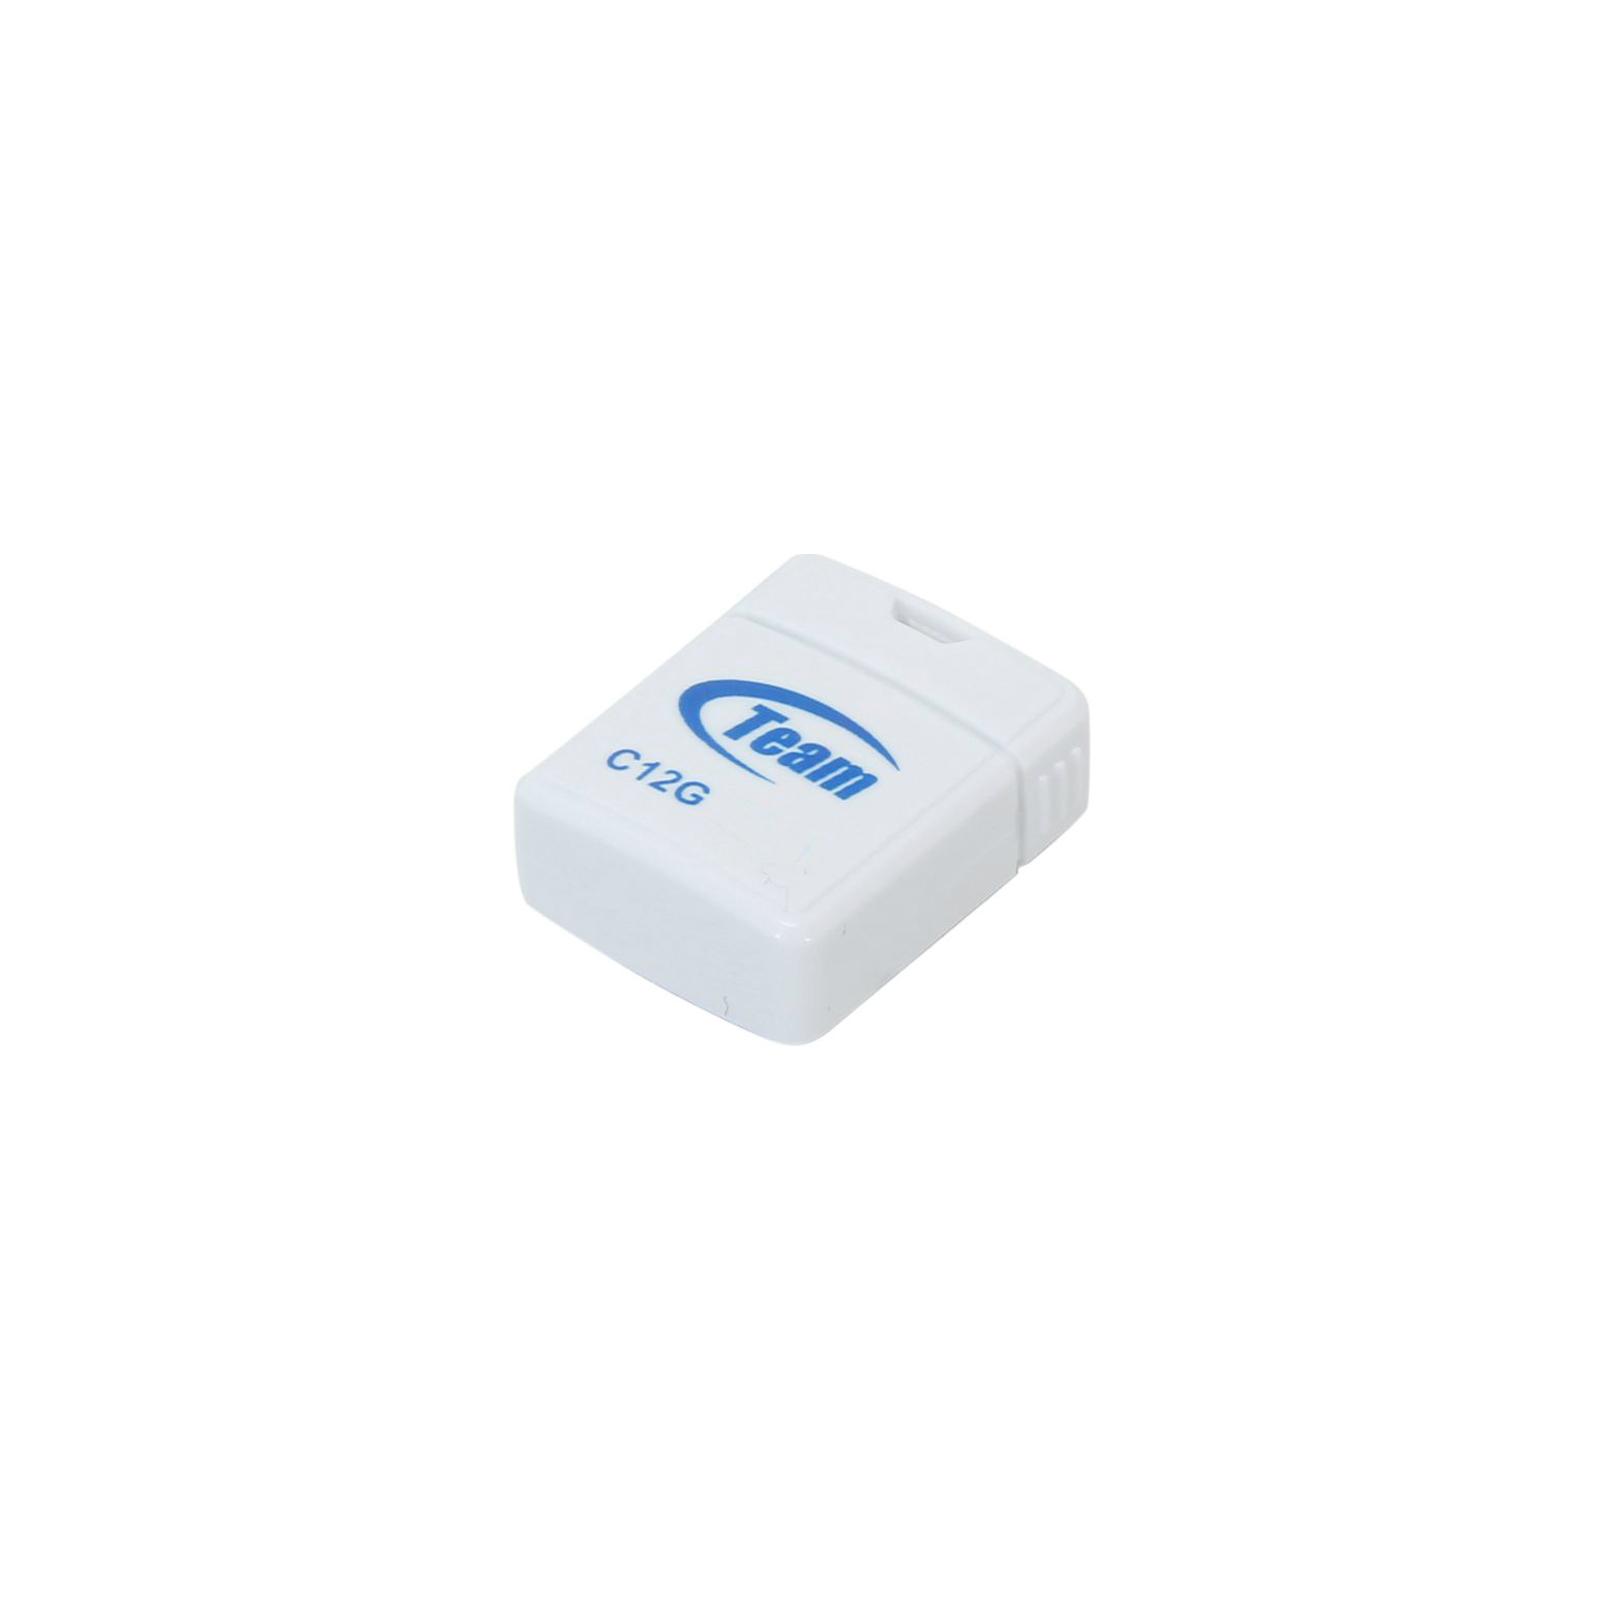 USB флеш накопитель Team 32GB C12G Black USB 2.0 (TC12G32GB01) изображение 2